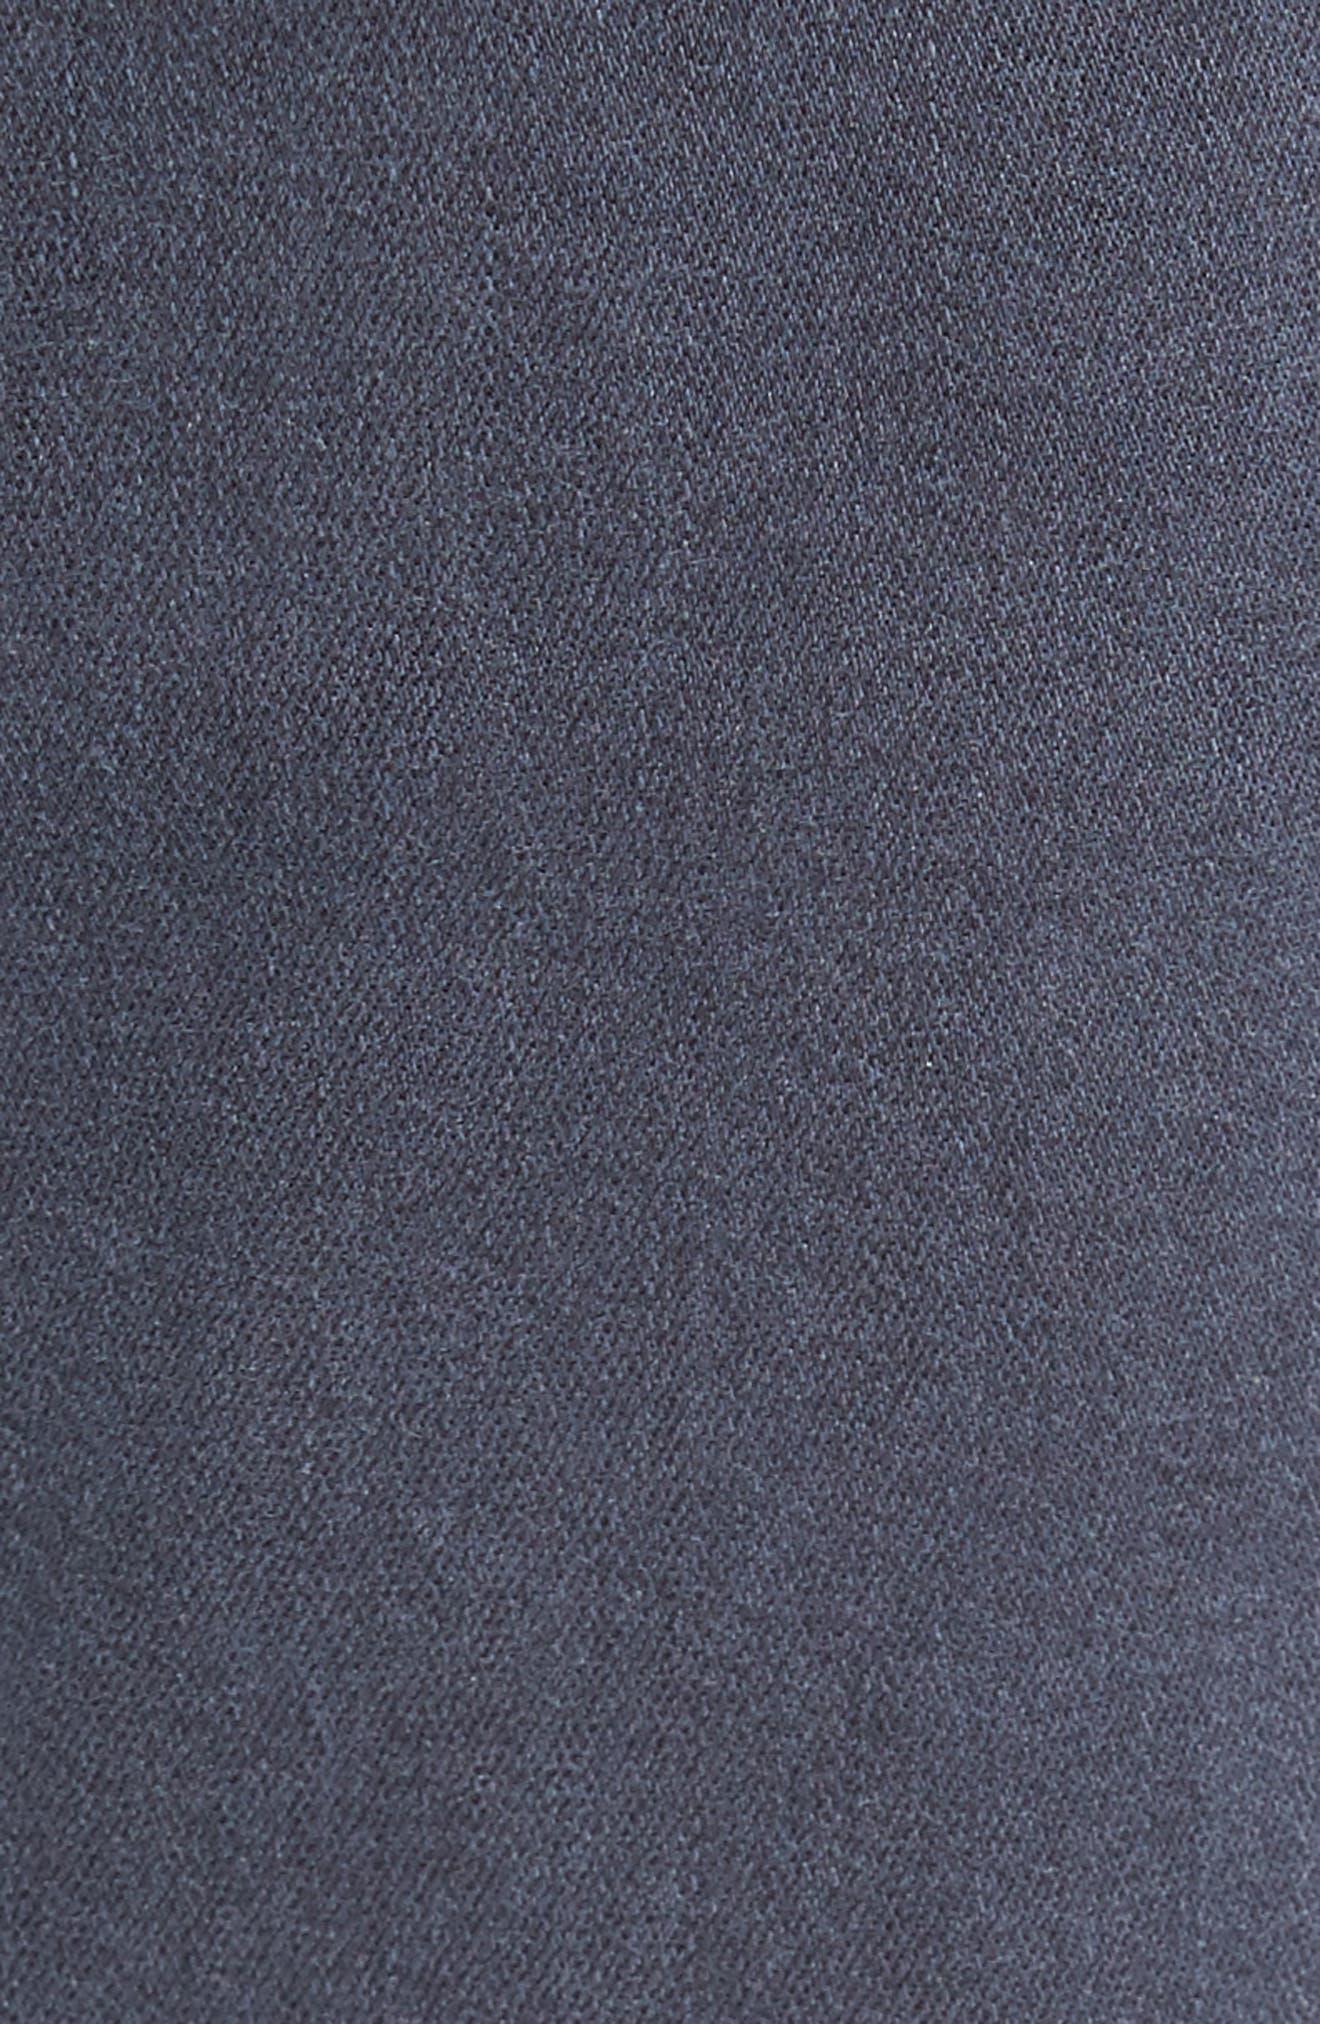 Transcend - Federal Slim Straight Leg Jeans,                             Alternate thumbnail 2, color,                             VINTAGE NAVY